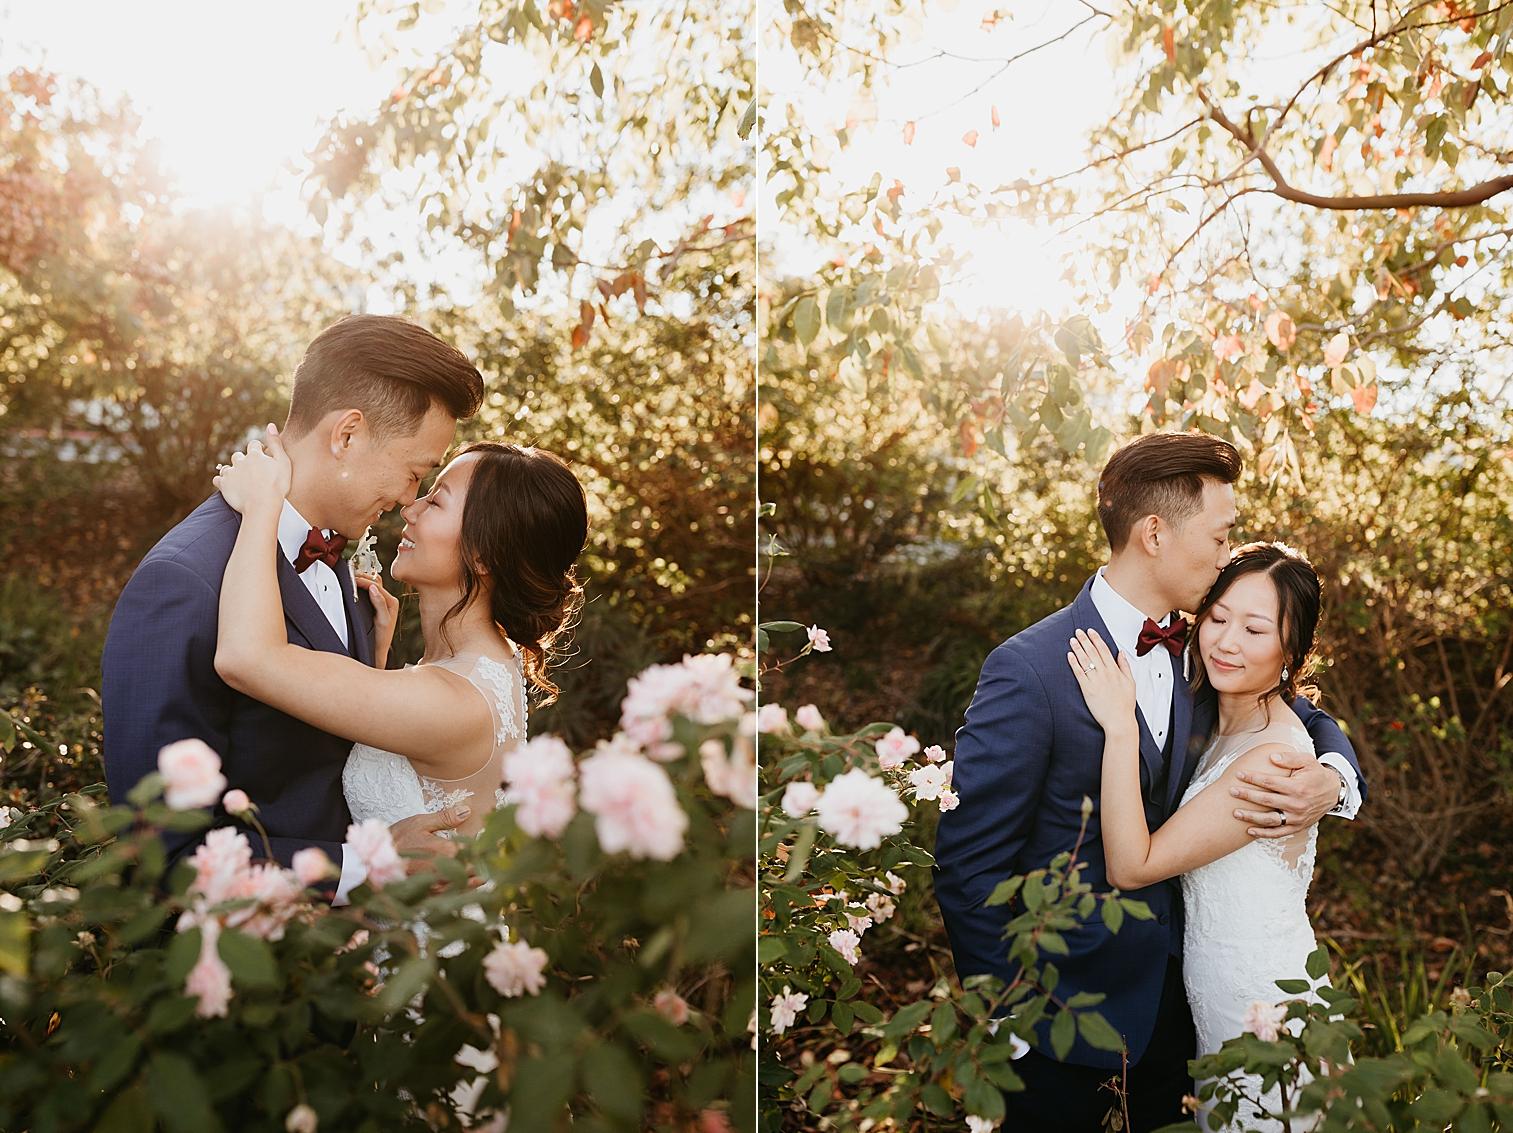 Secret-Garden-Rancho-Santa-Fe-Wedding-84.jpg